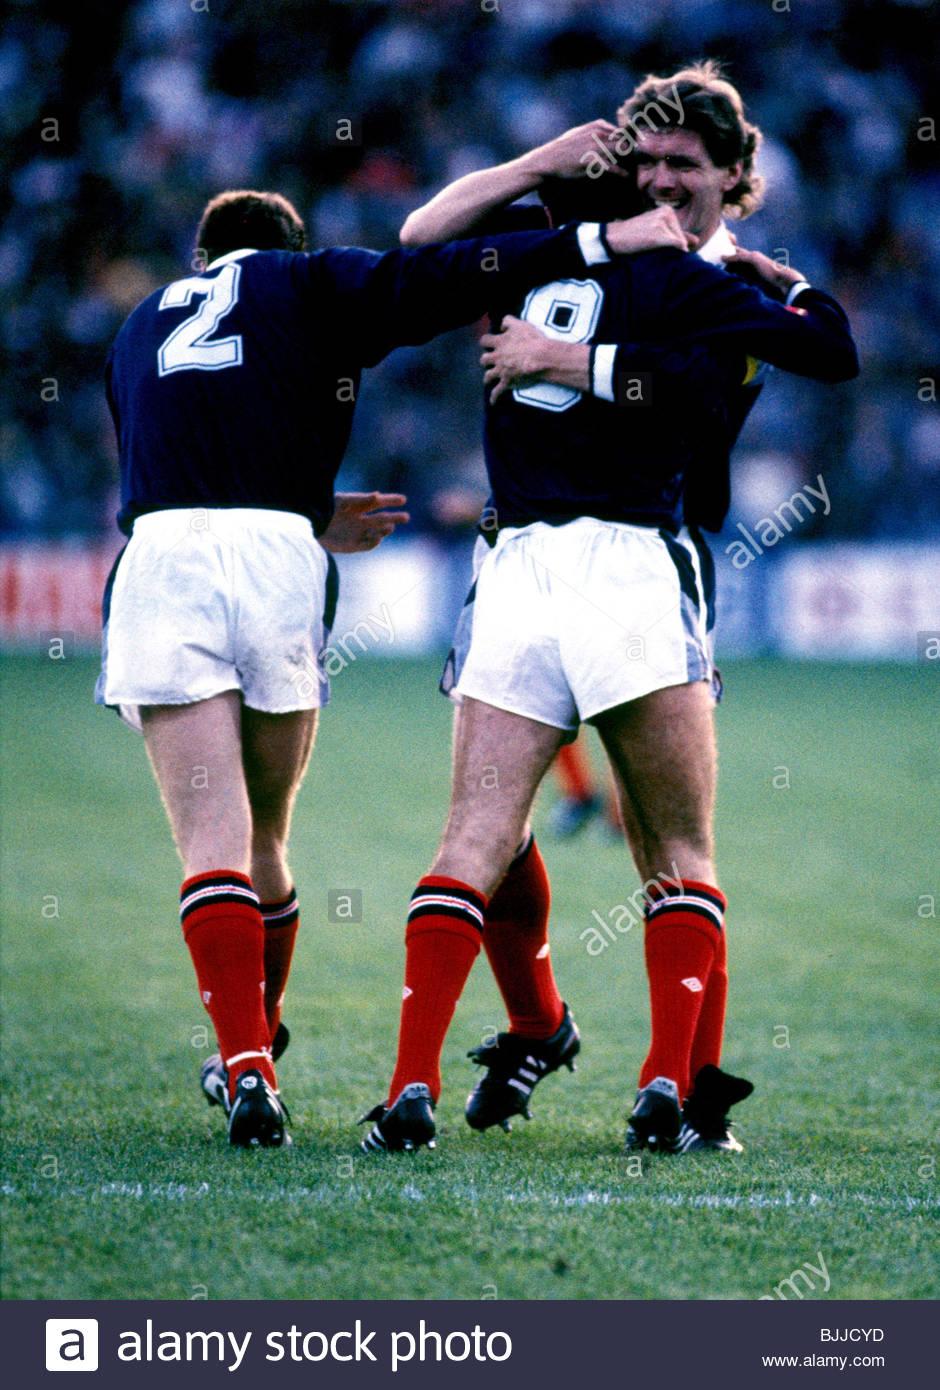 14/09/88 WORLD CUP QUALIFIER NORWAY V SCOTLAND (1-2) ULLEVAAL STADIUM - OSLO Scotland's Steve Nicol (left) Paul - Stock Image